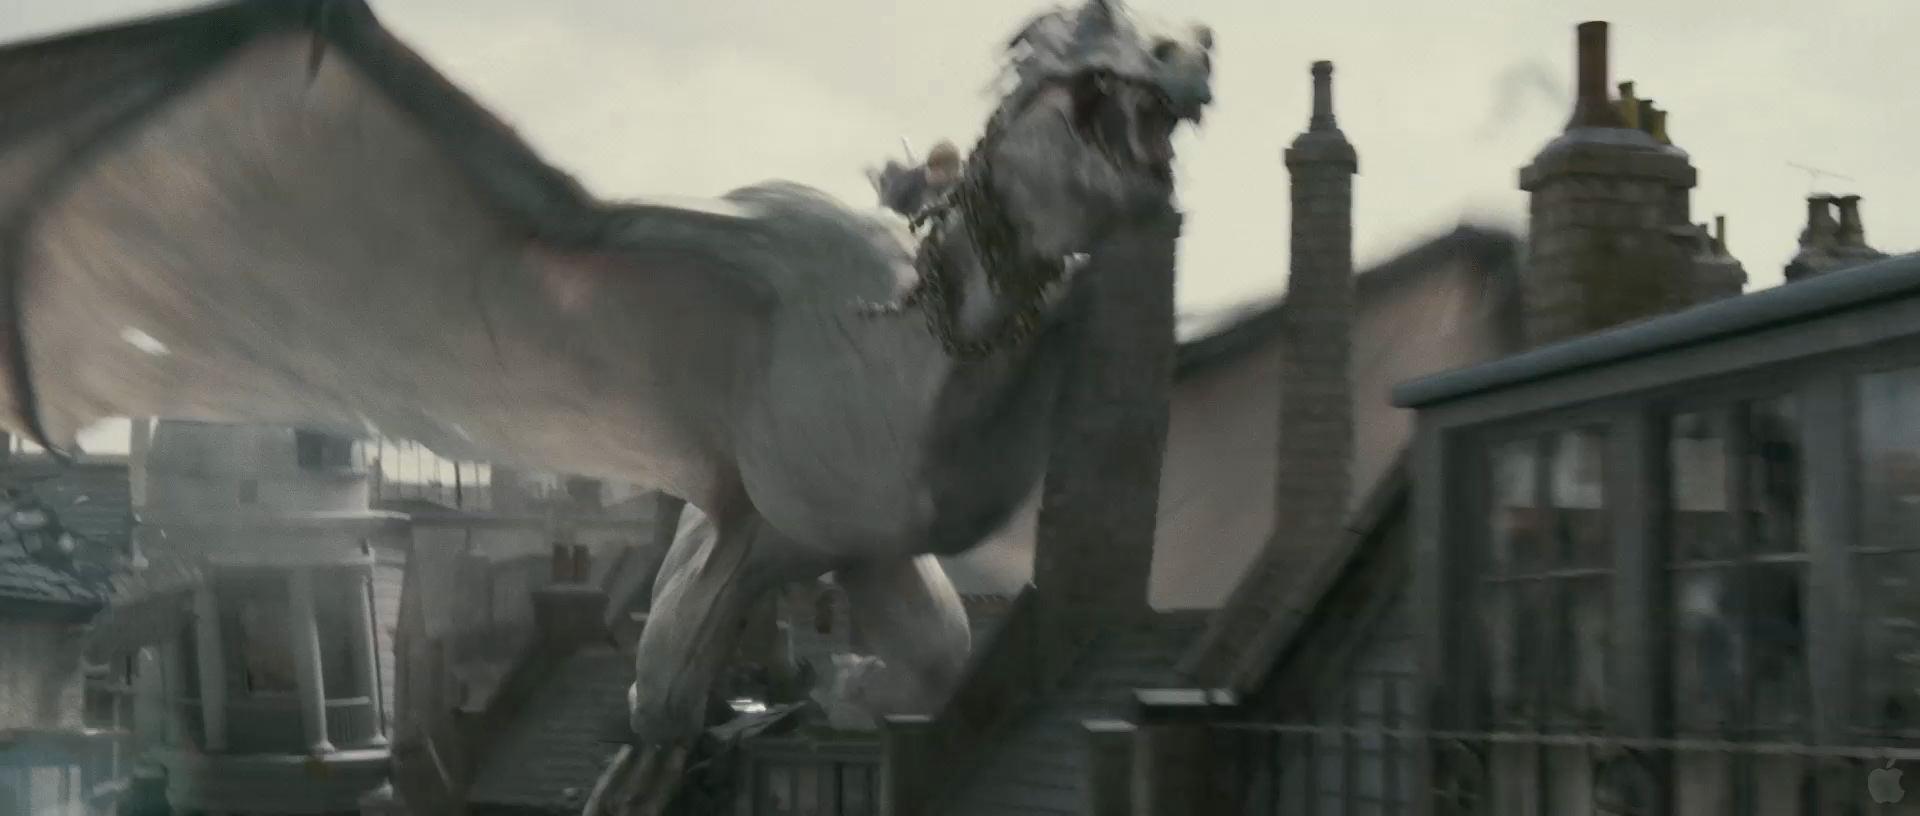 Harry Potter BlogHogwarts HP7 2 Trailer 80